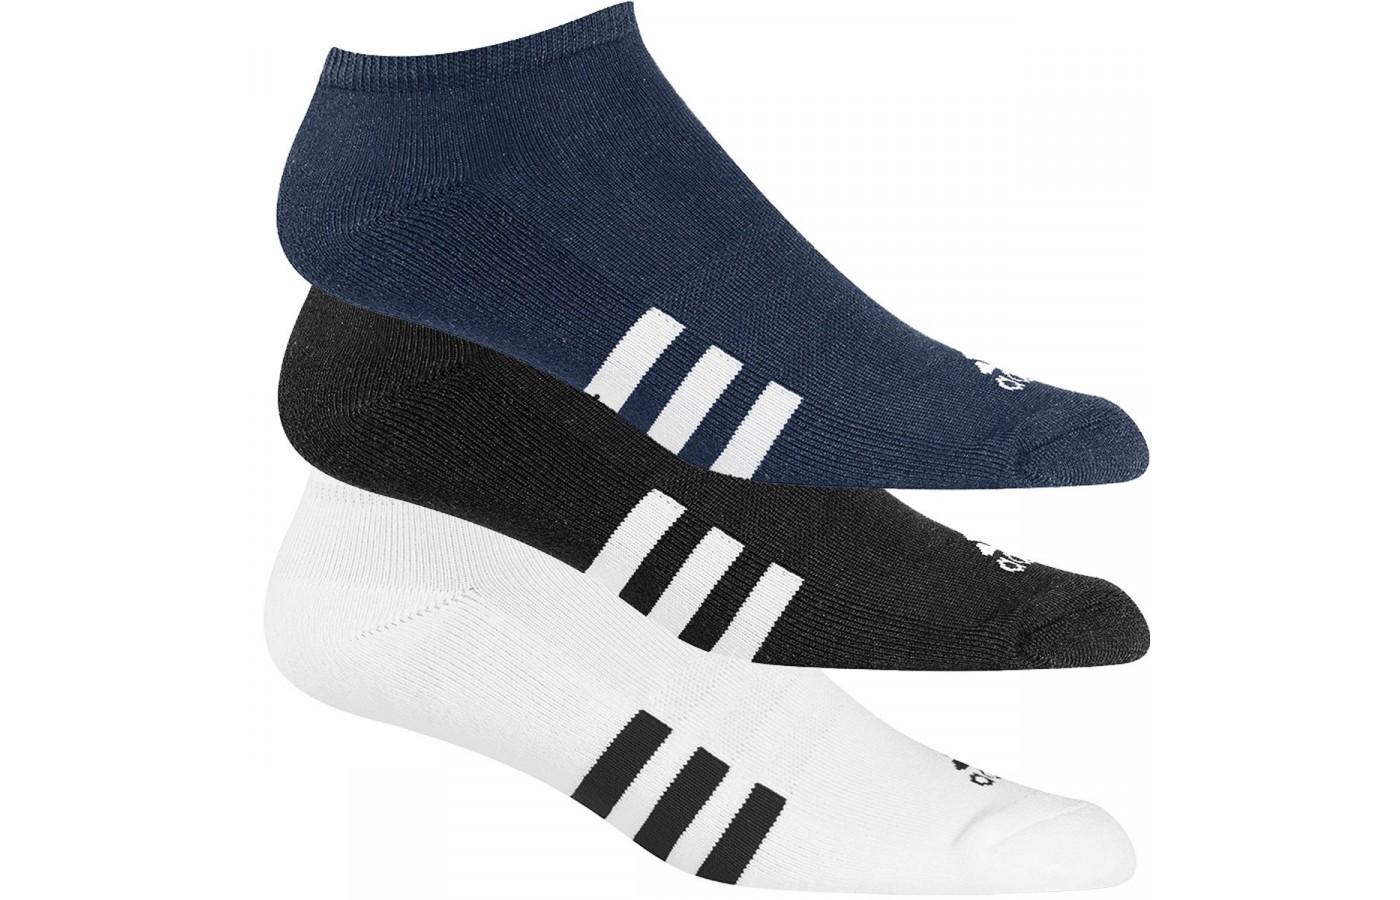 AdidasGolfVariety